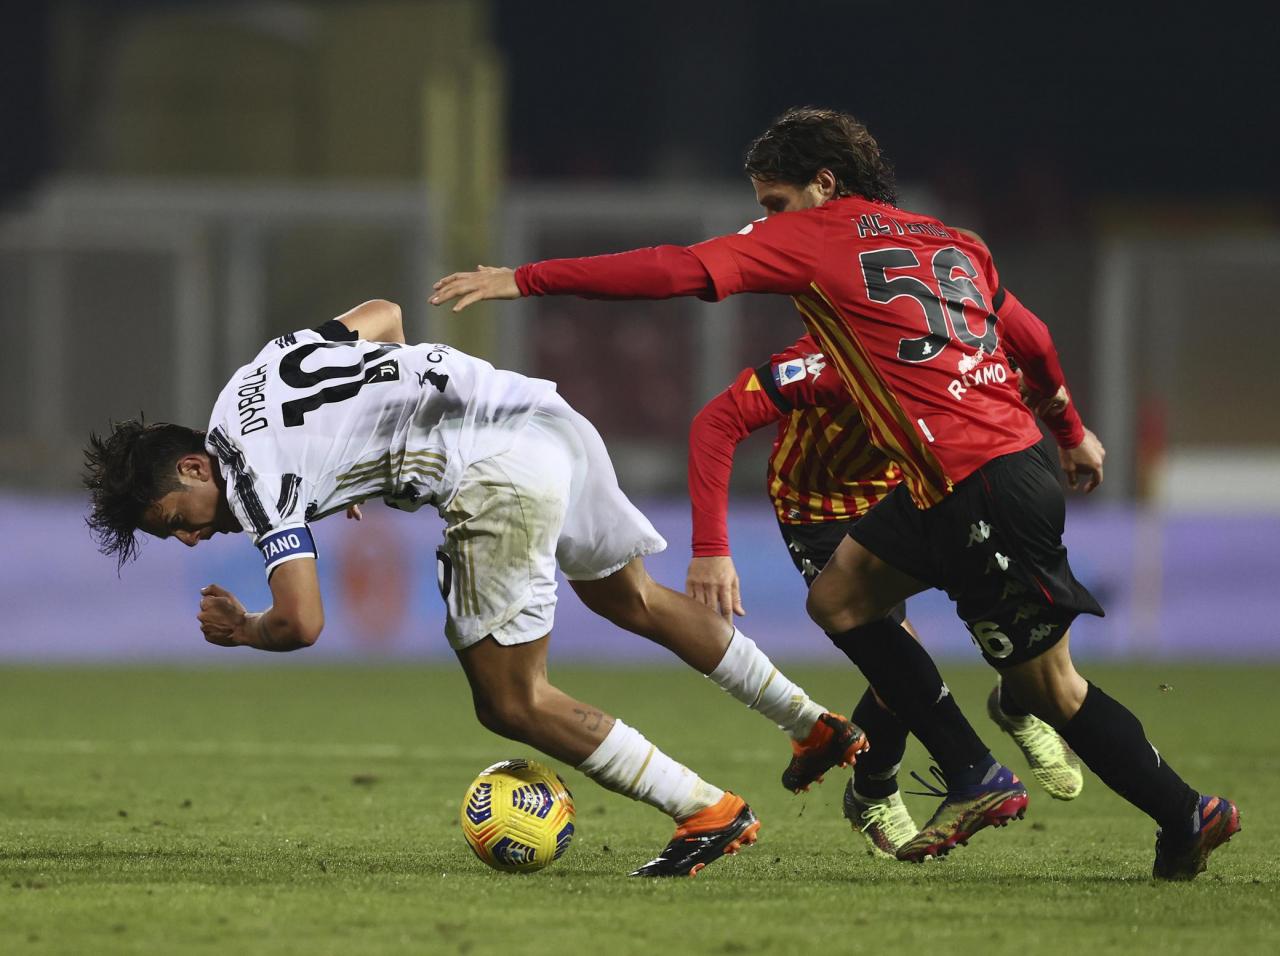 Senza Ronaldo la Juve si perde: 1-1 col Benevento - Ticinonline